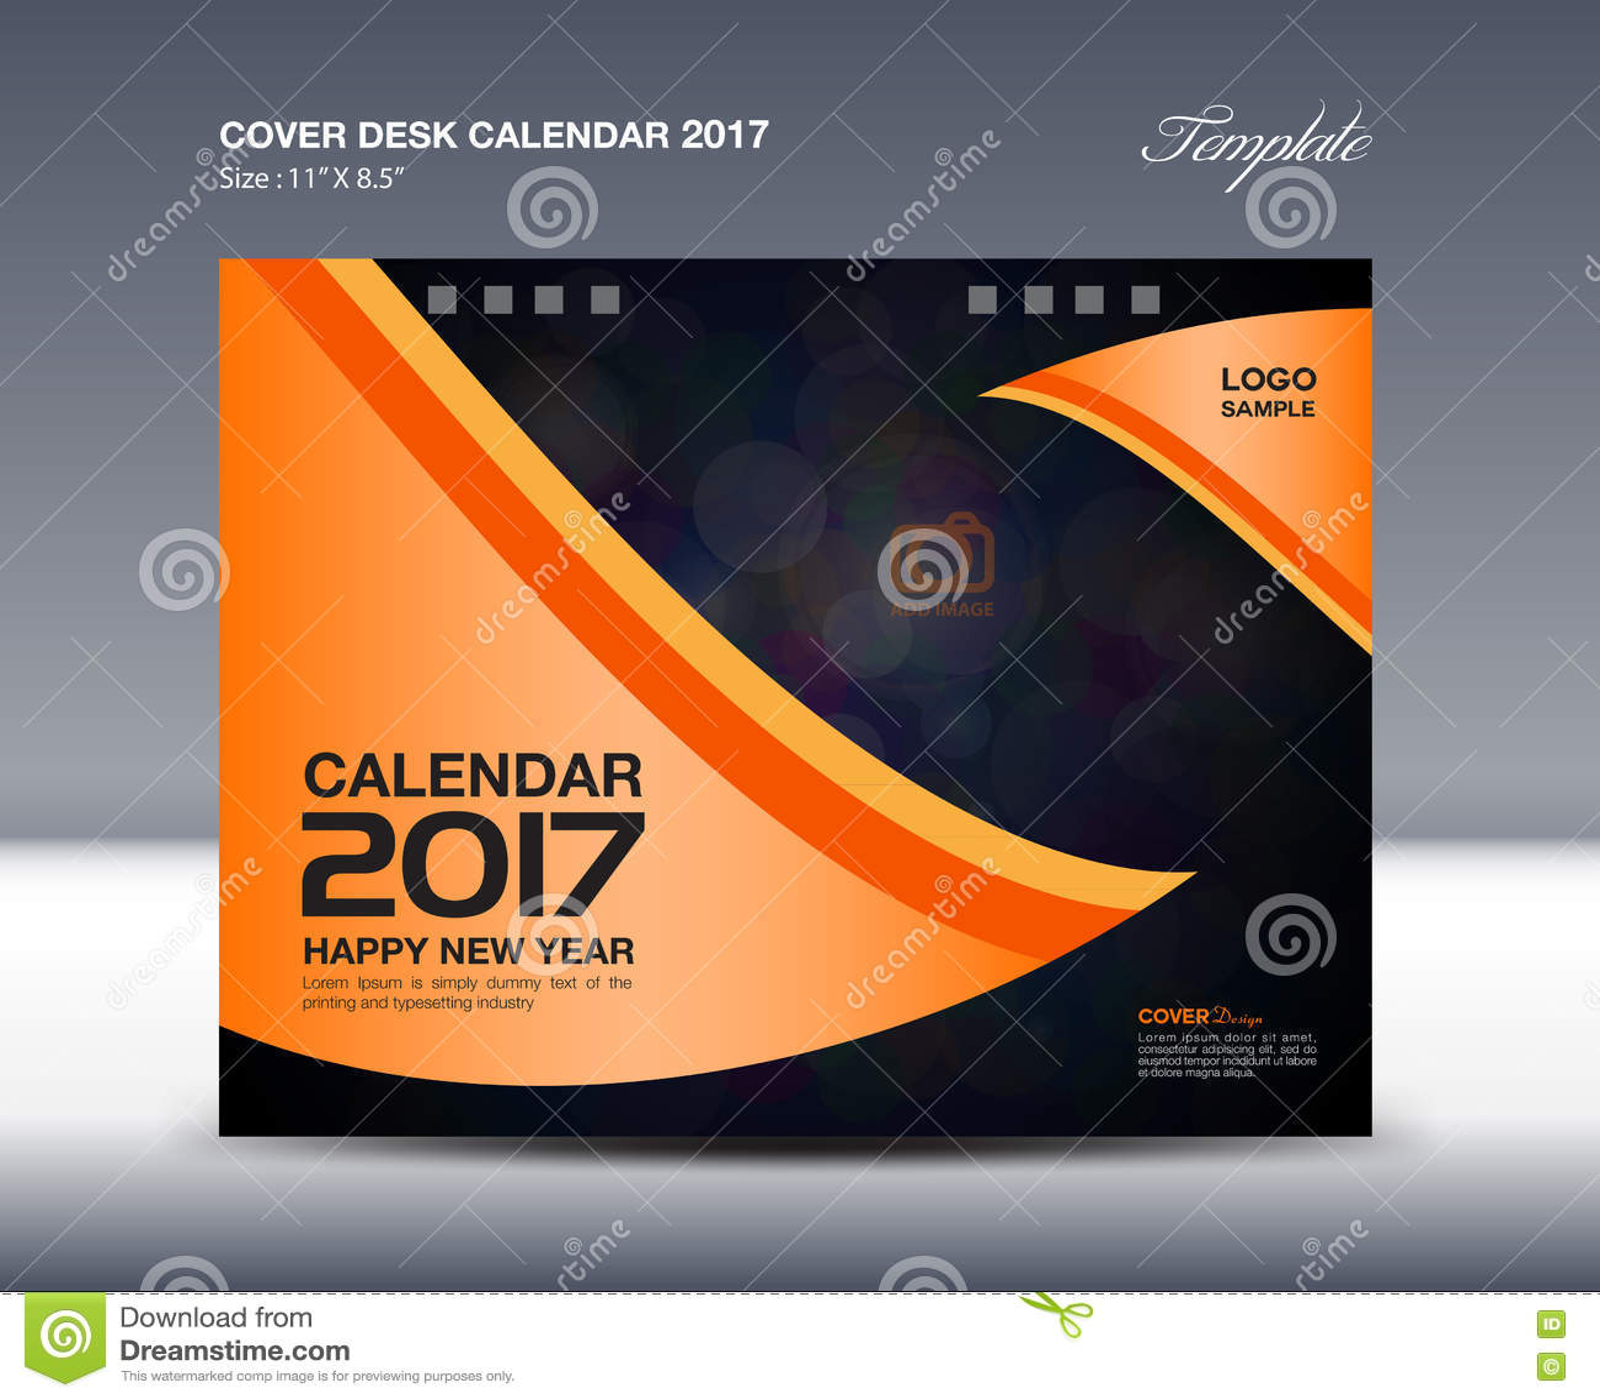 Cover Calendar Design Vector : Orange desk calendar for year cover